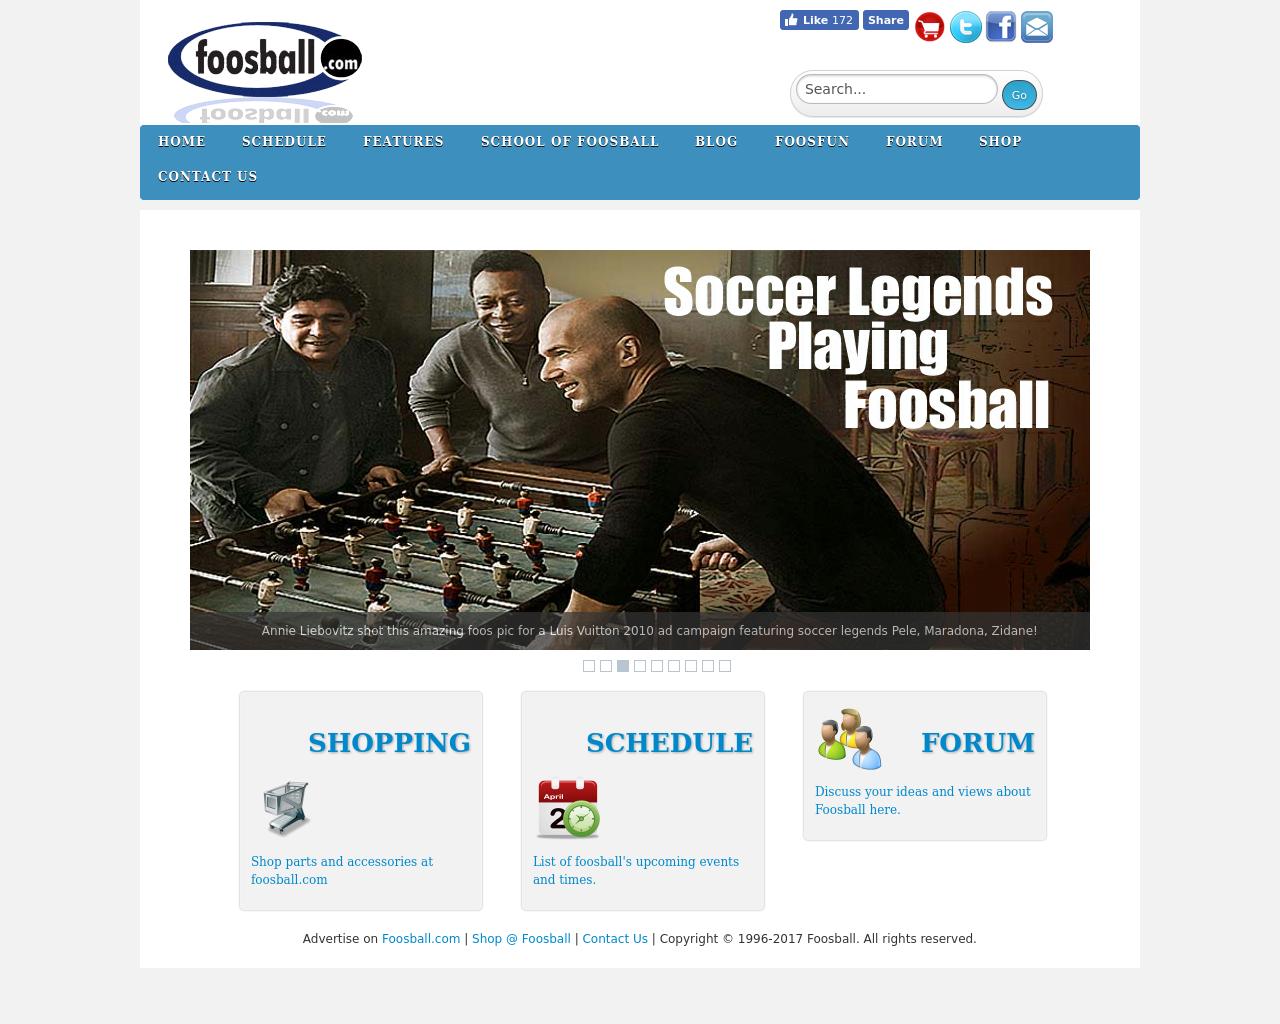 Foosball.com-Advertising-Reviews-Pricing